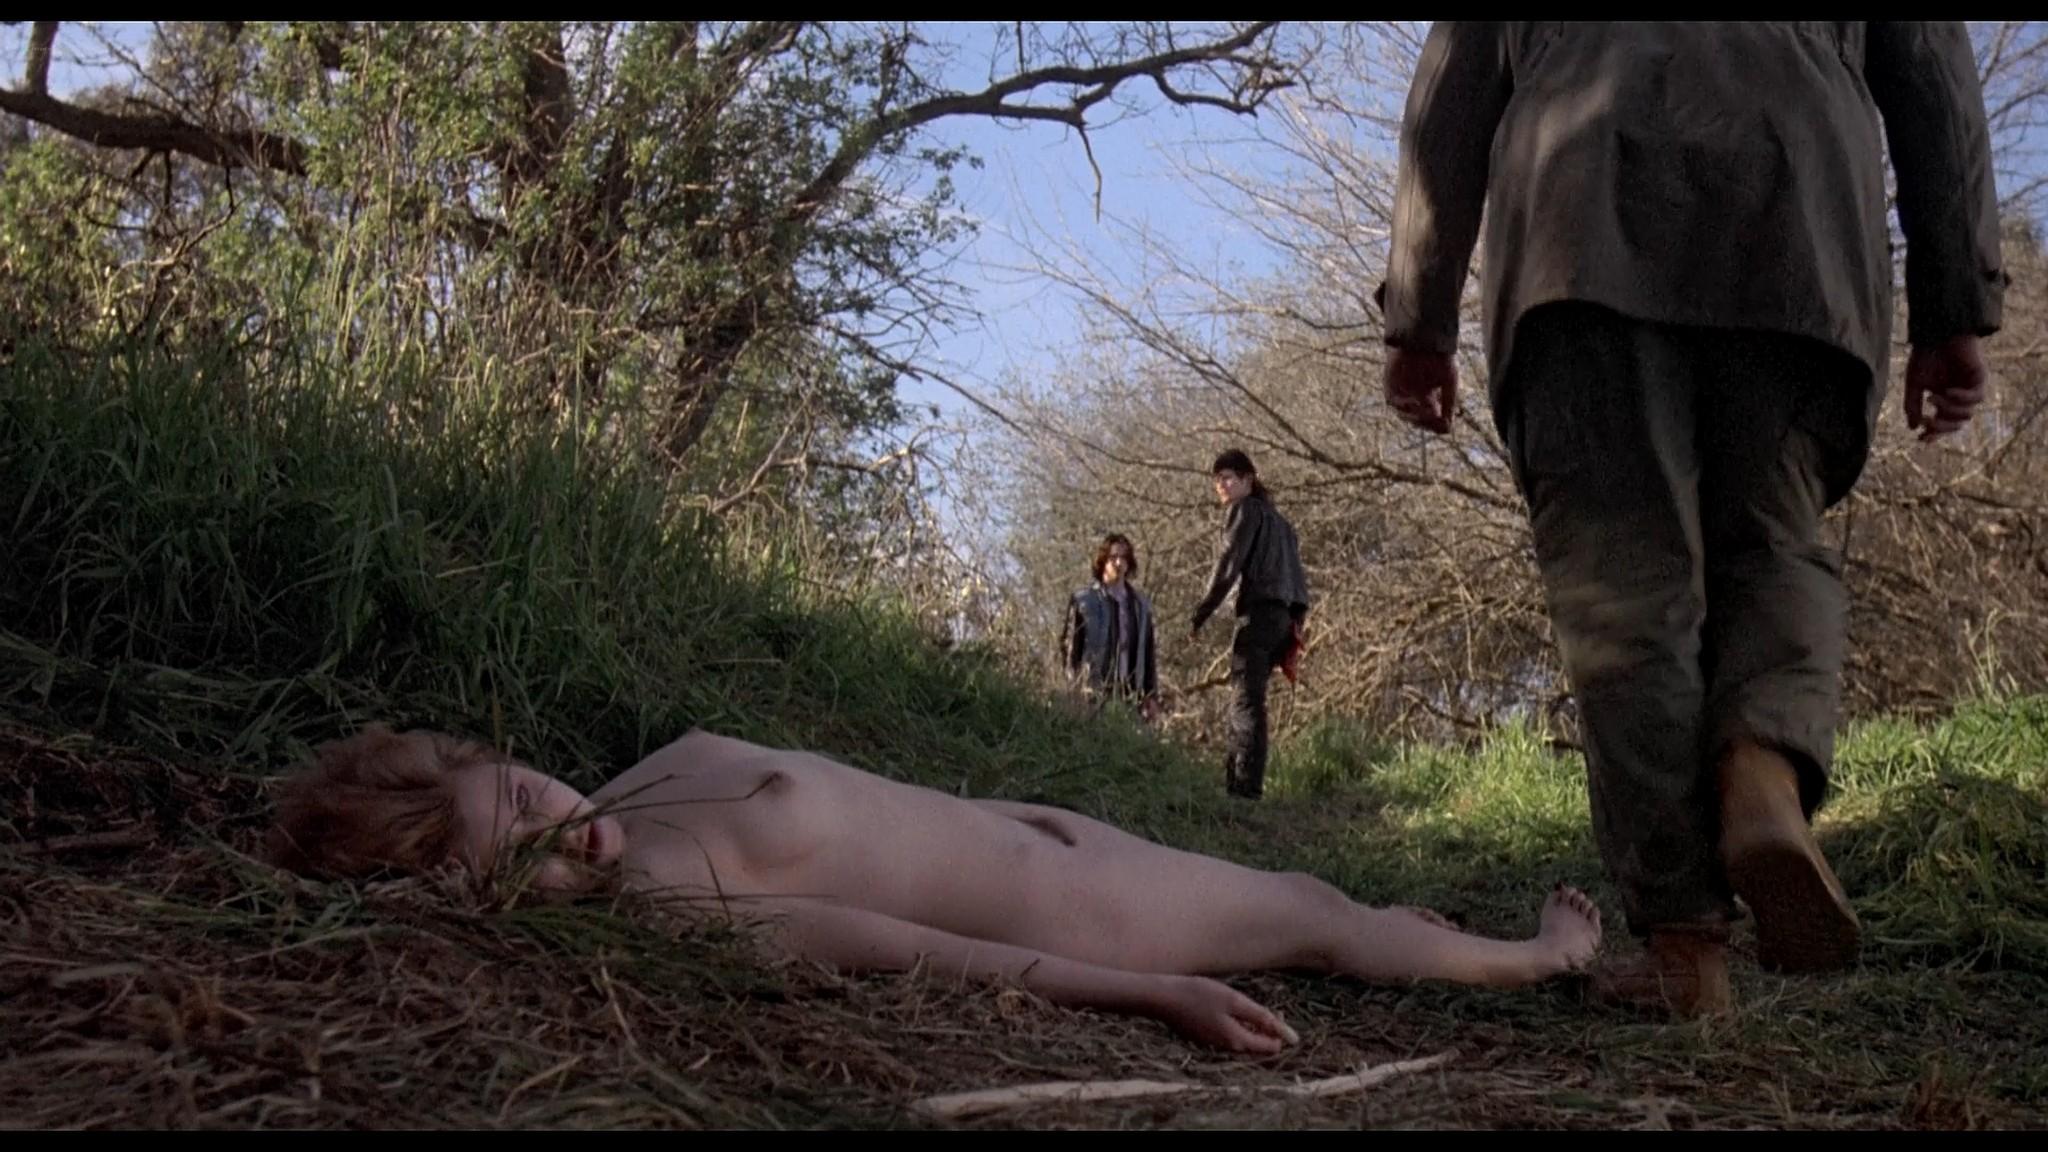 Danyi Deats nude bush topless but dead Rivers Edge 1986 HD 1080p BluRay 8